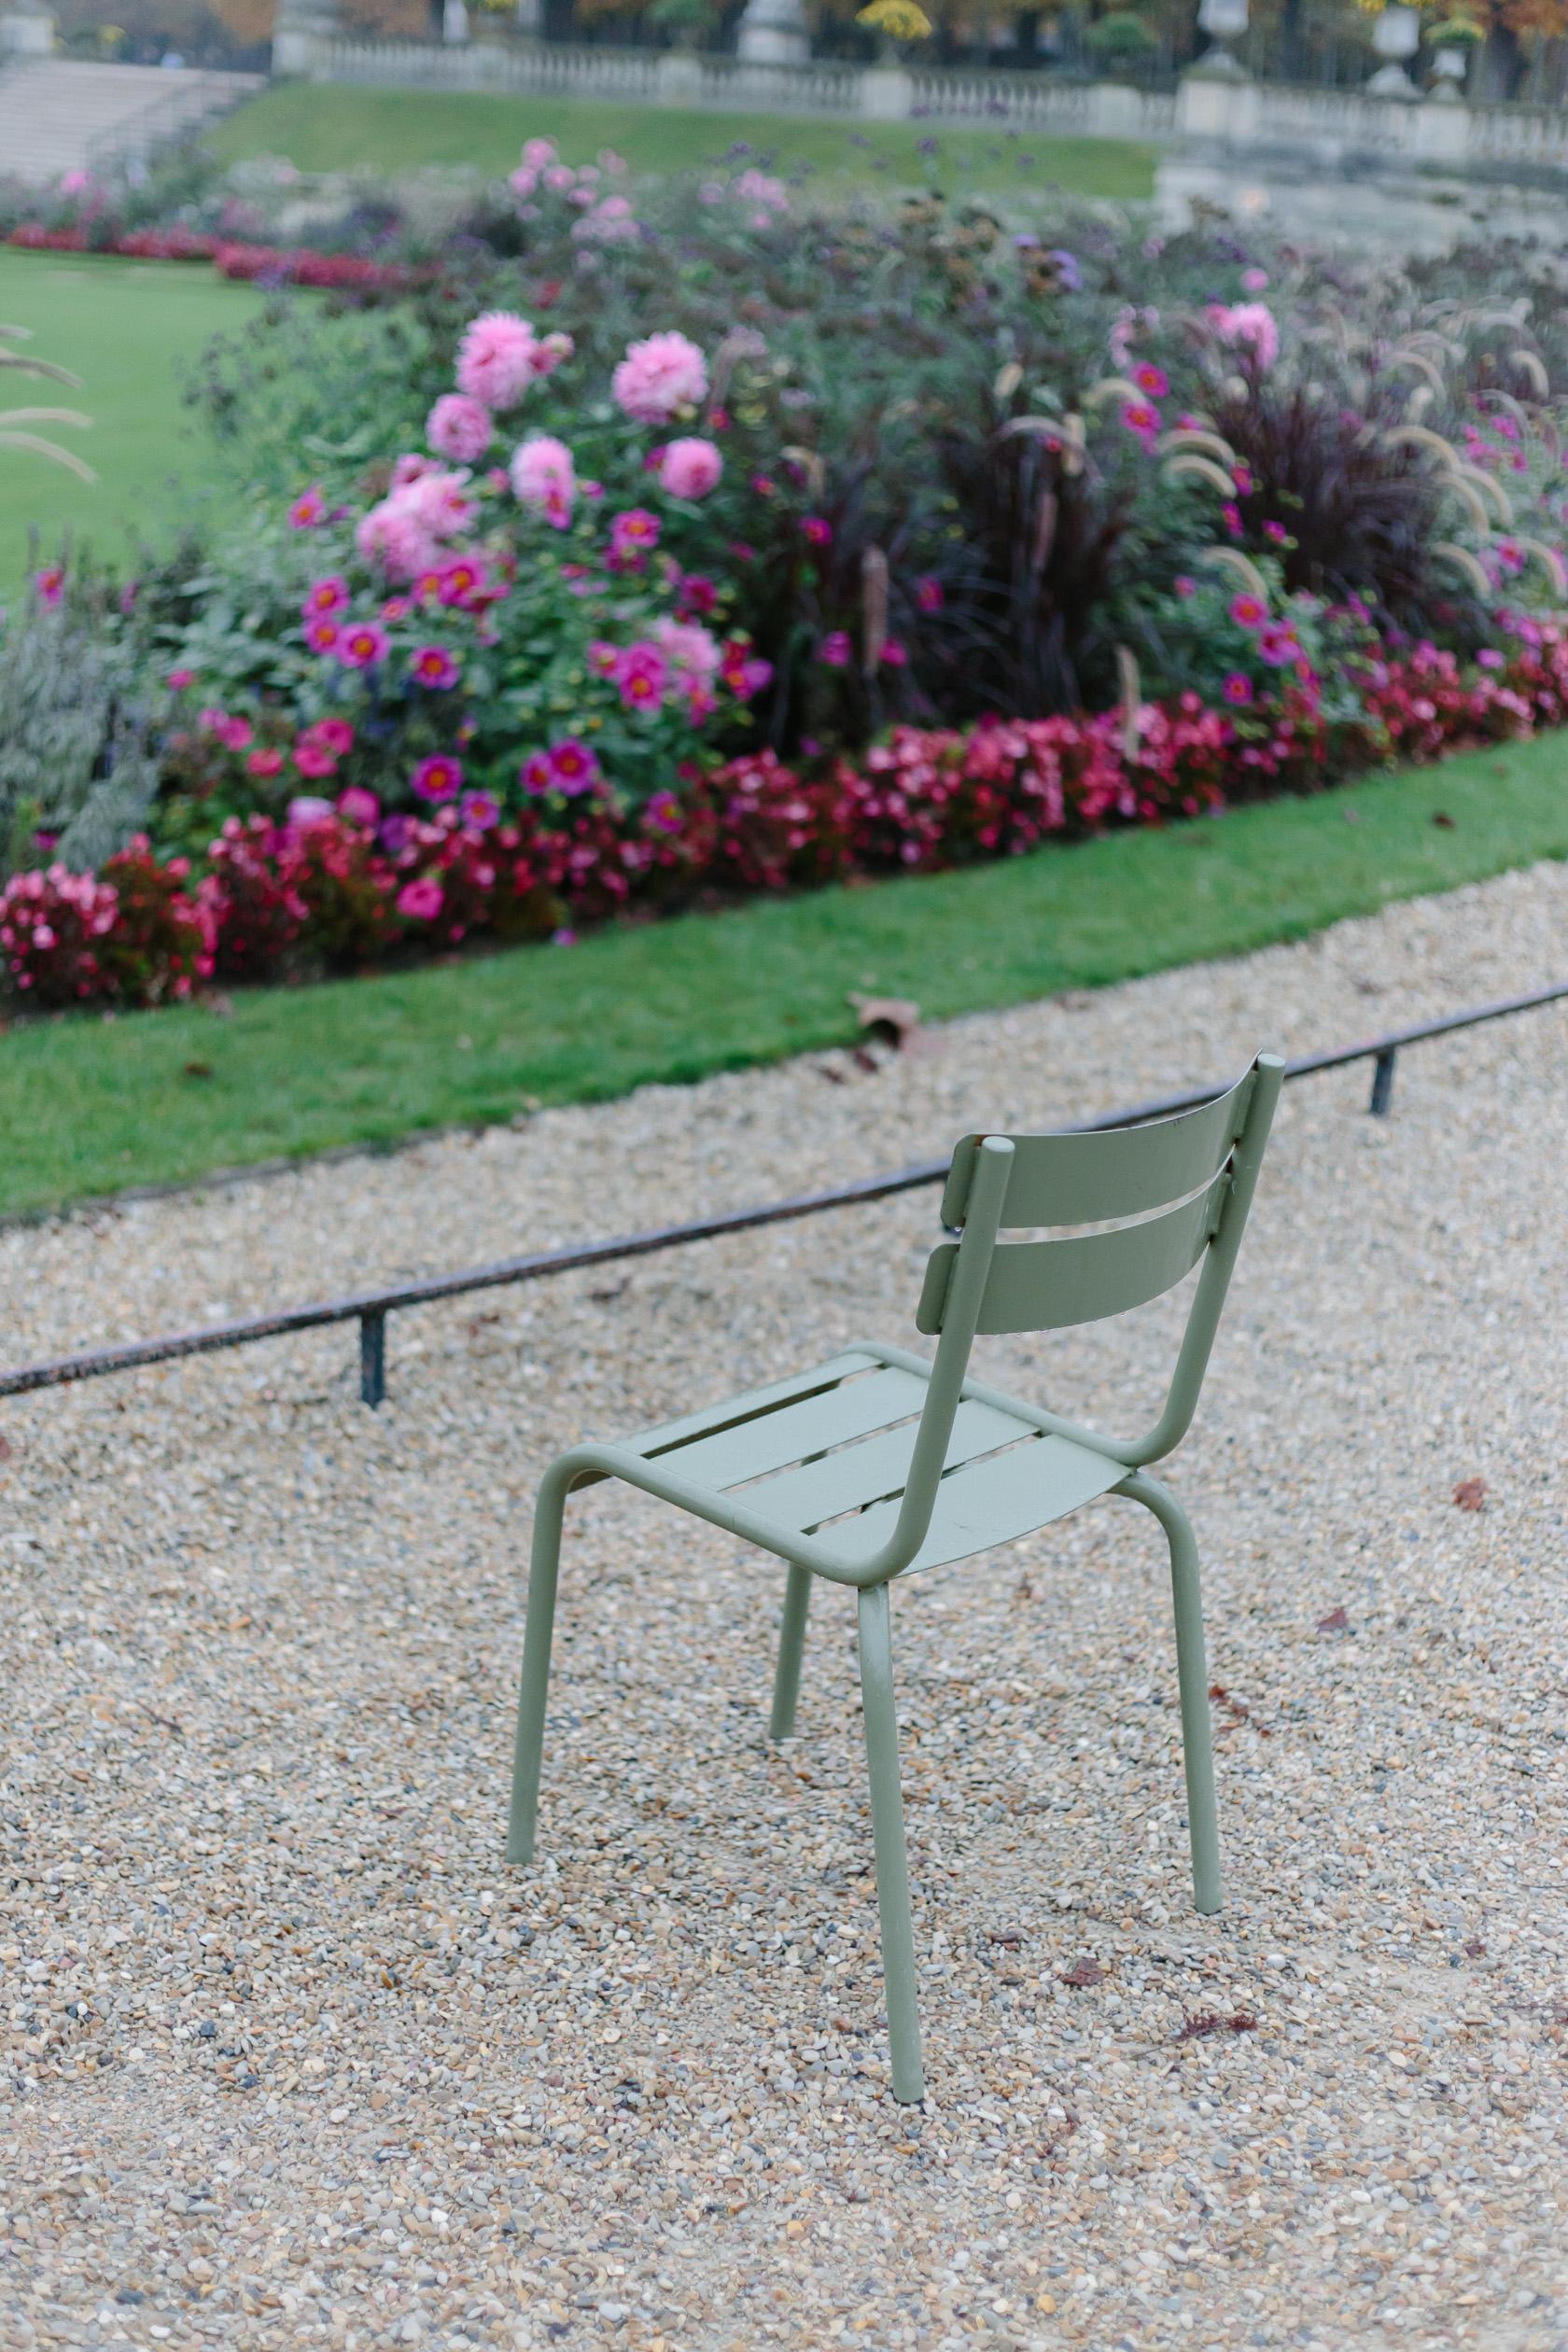 jardin-du-luxembourg-paris-4923